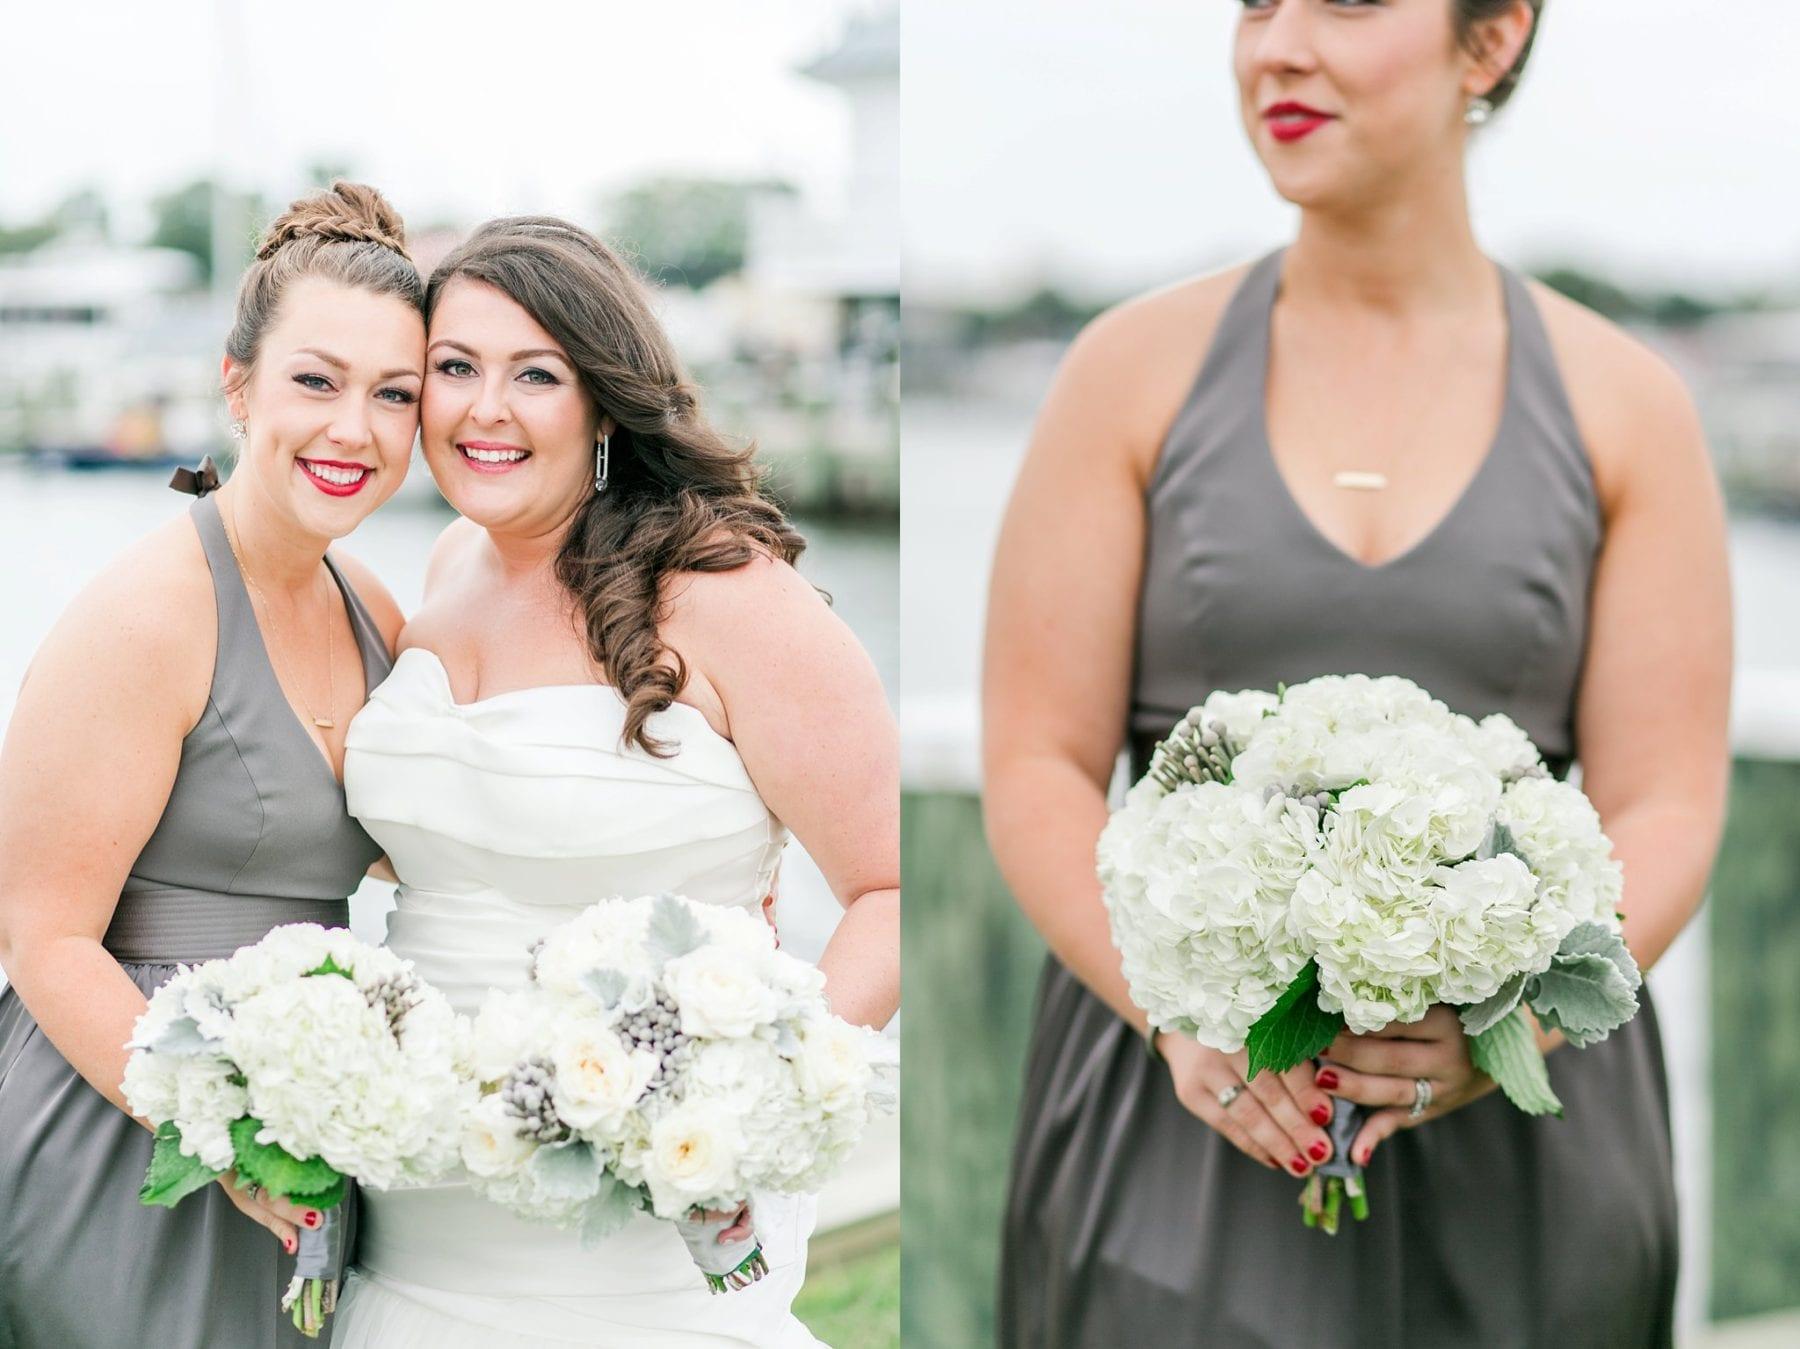 Chesapeake Bay Maritime Museum Wedding Photos Maryland Wedding Photographer Megan Kelsey Photography Halie & Mike-84.jpg